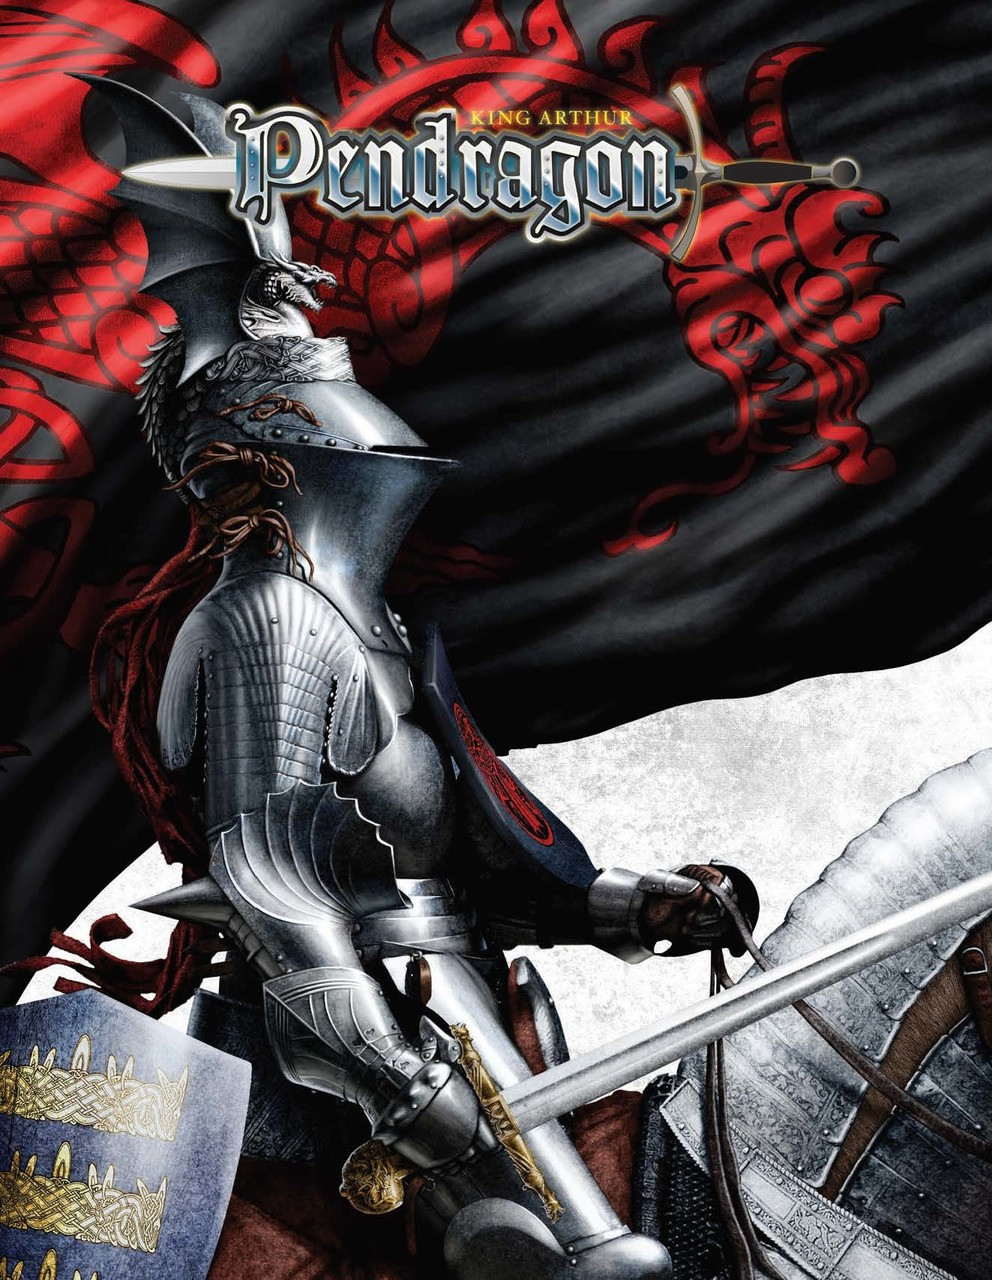 King arthur pendragon bundle – more glorious than ever – beyond.